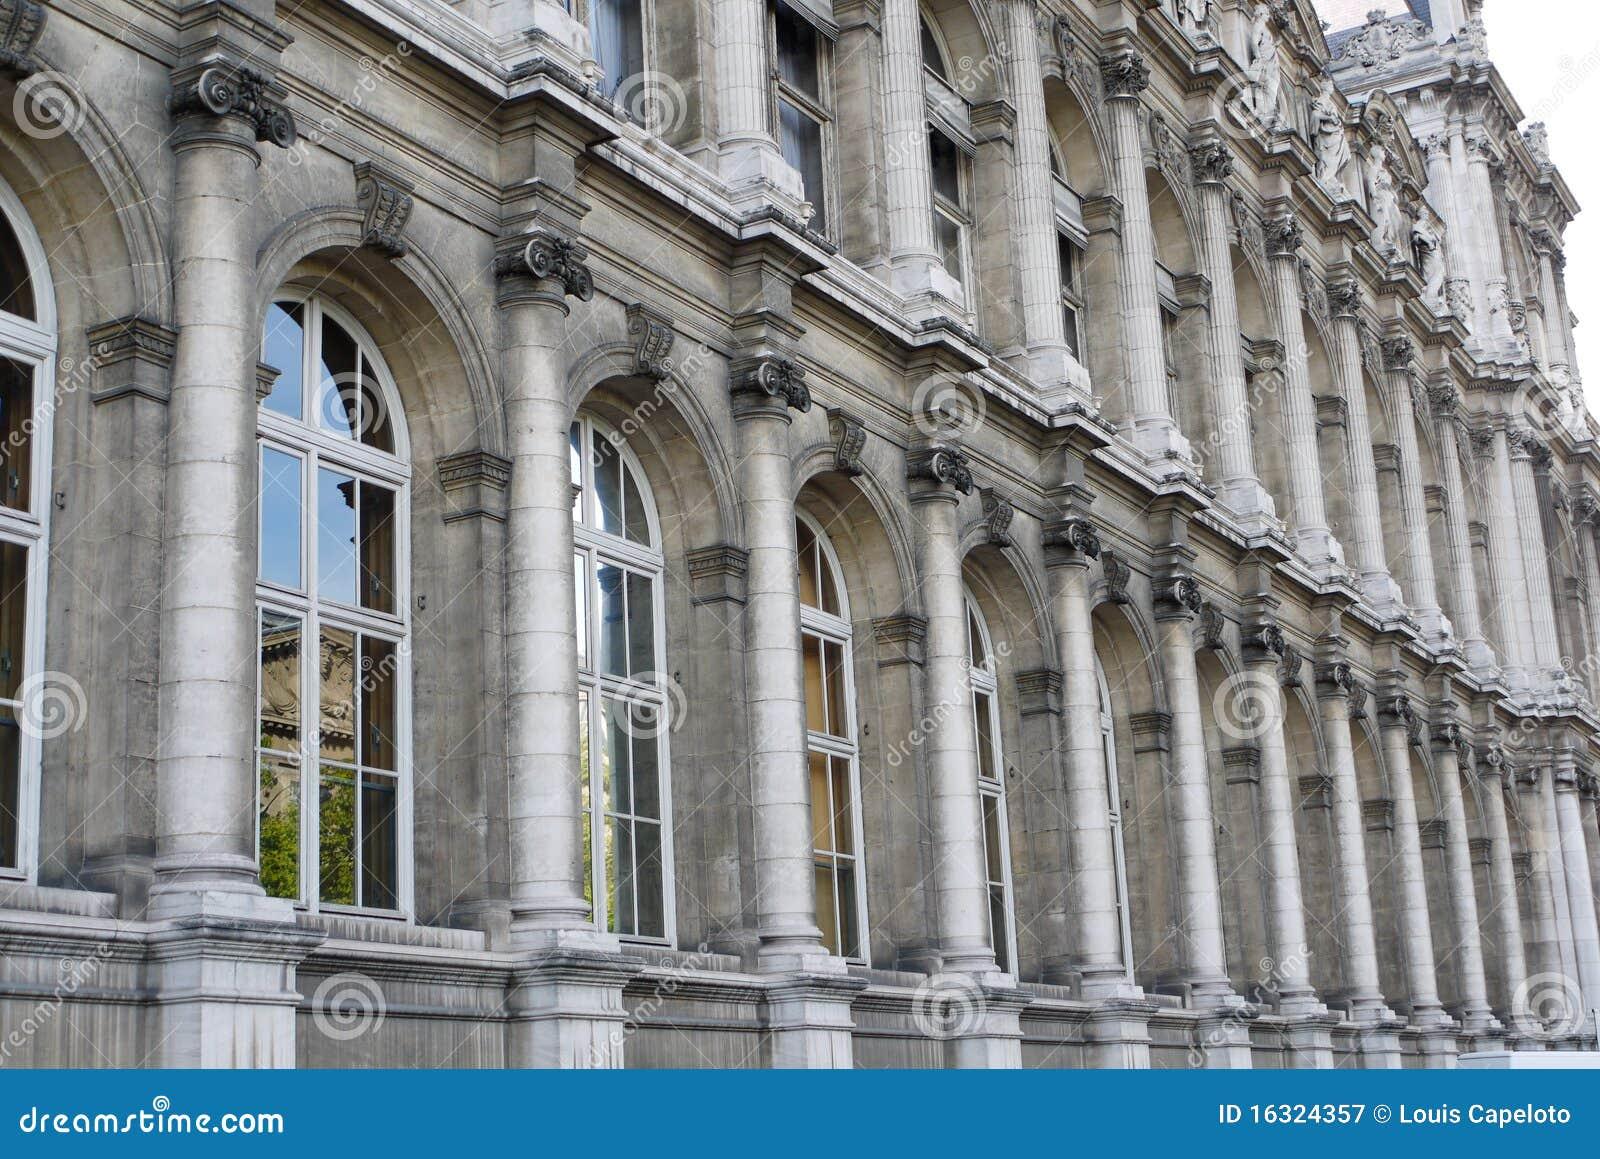 Architettura classica a parigi fotografia stock libera da for Architettura a parigi